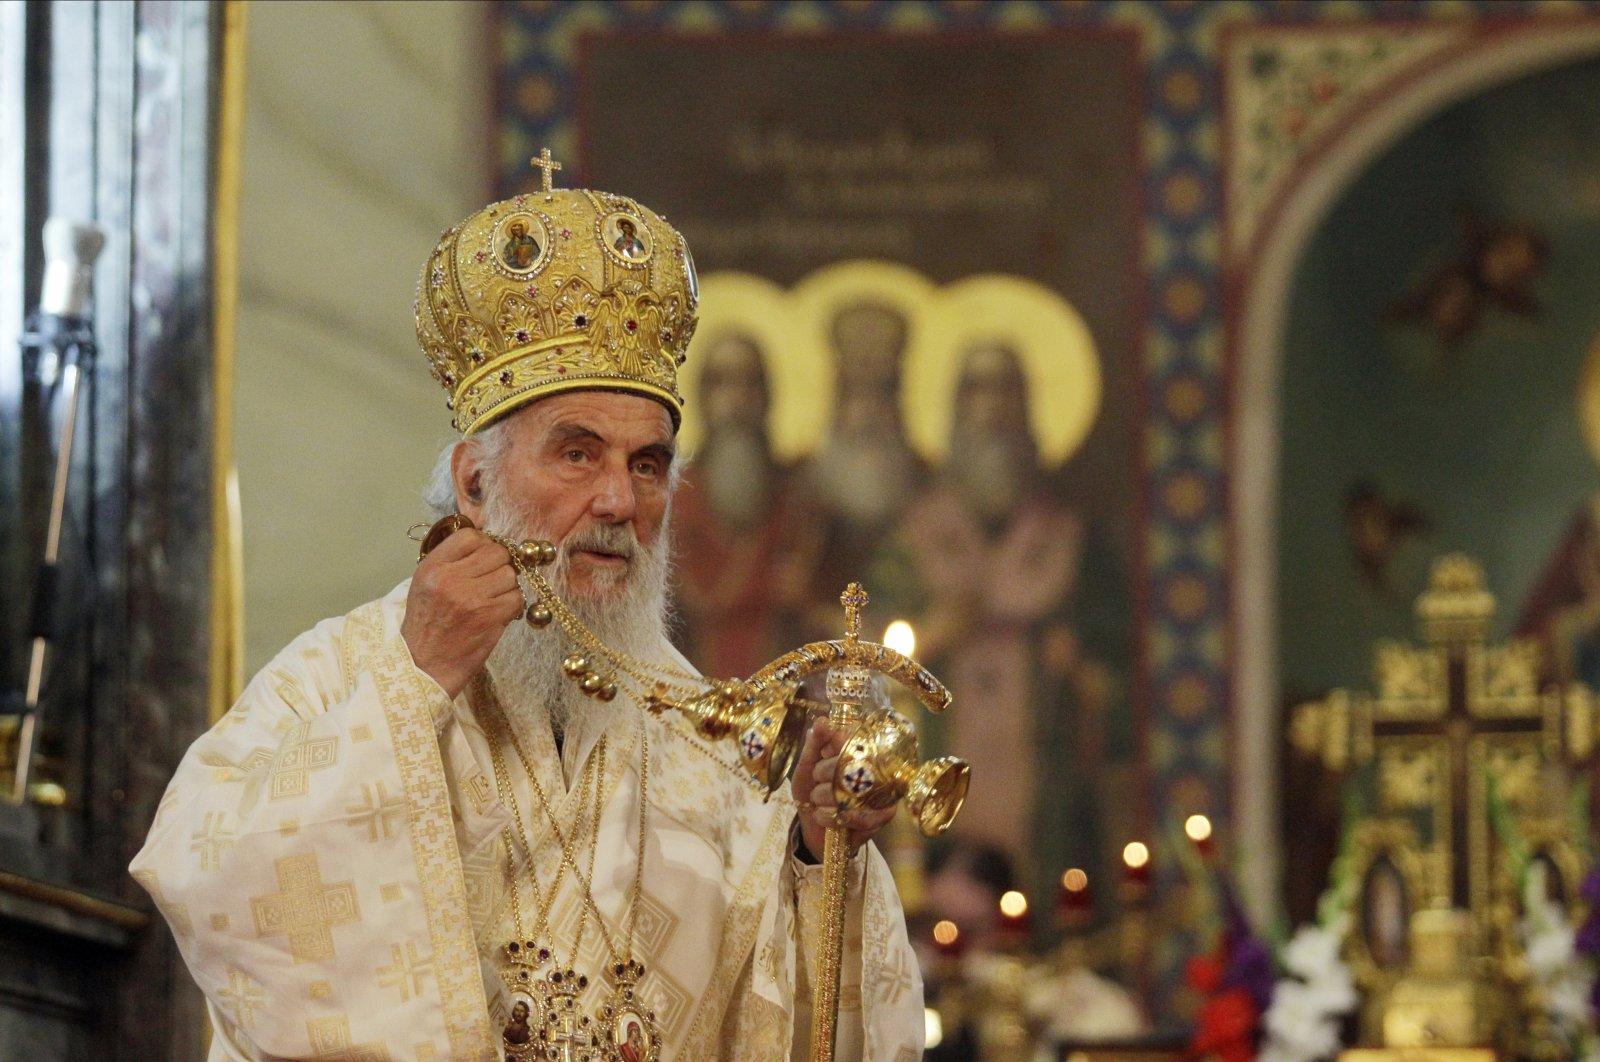 Serbian Orthodox Church Patriarch Irinej delivers mass in Belgrade, Serbia, July 26, 2014. (EPA Photo)